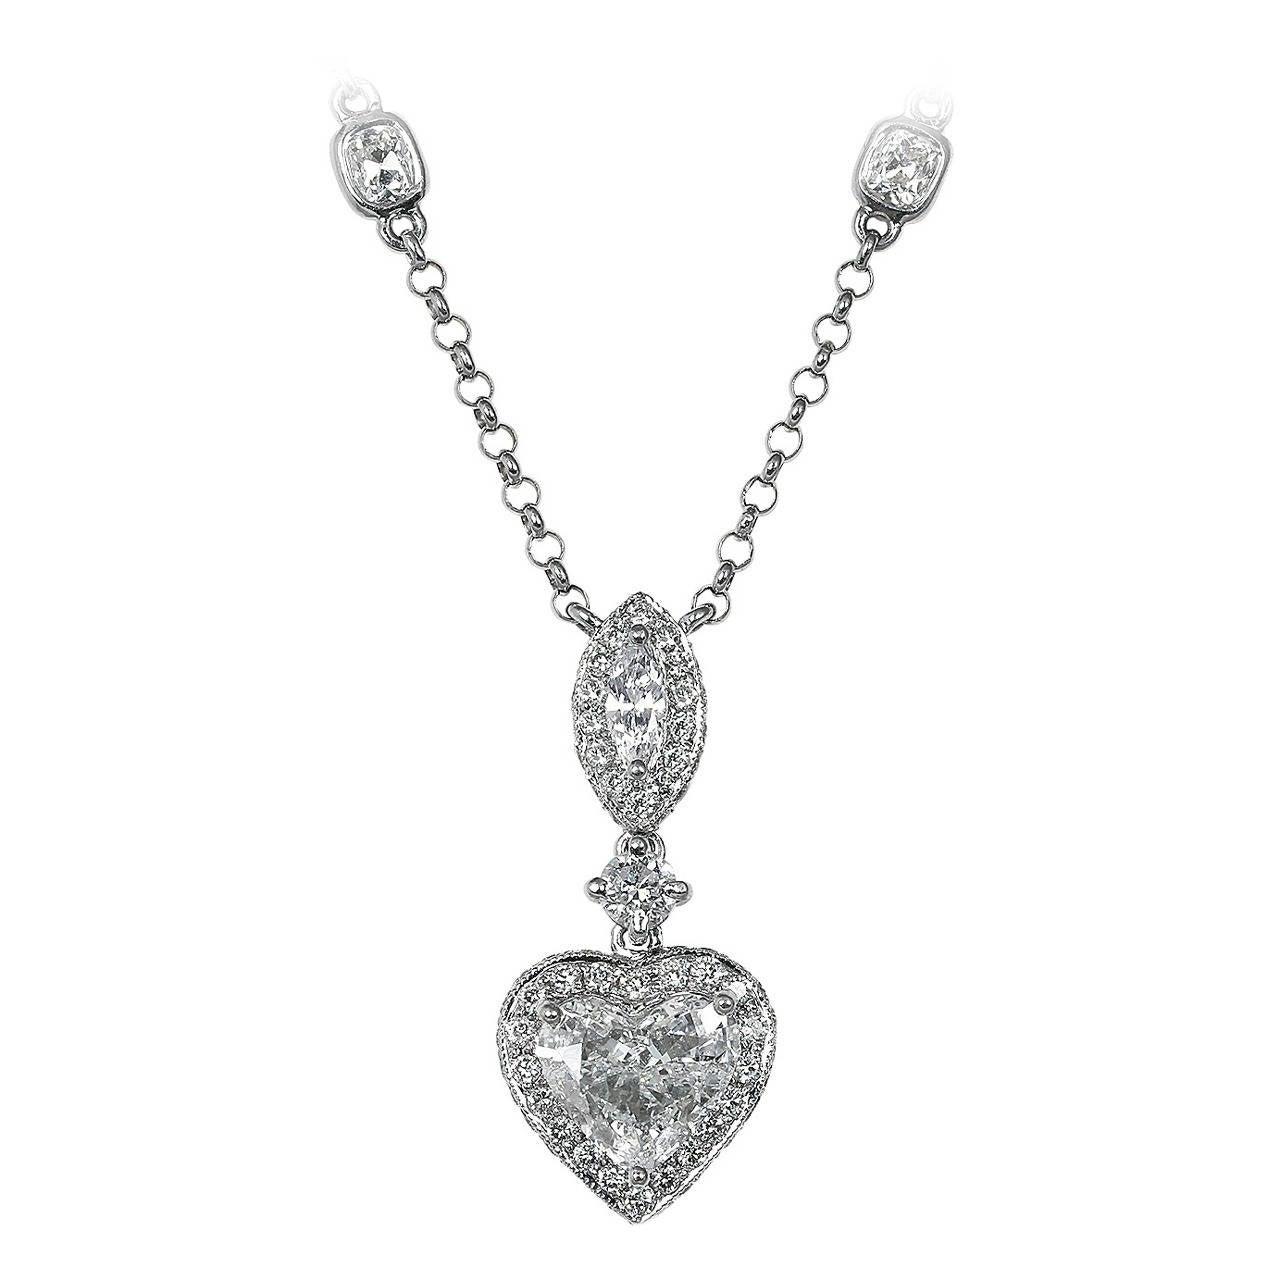 1.06 Carat Diamond Gold Heart Necklace 1